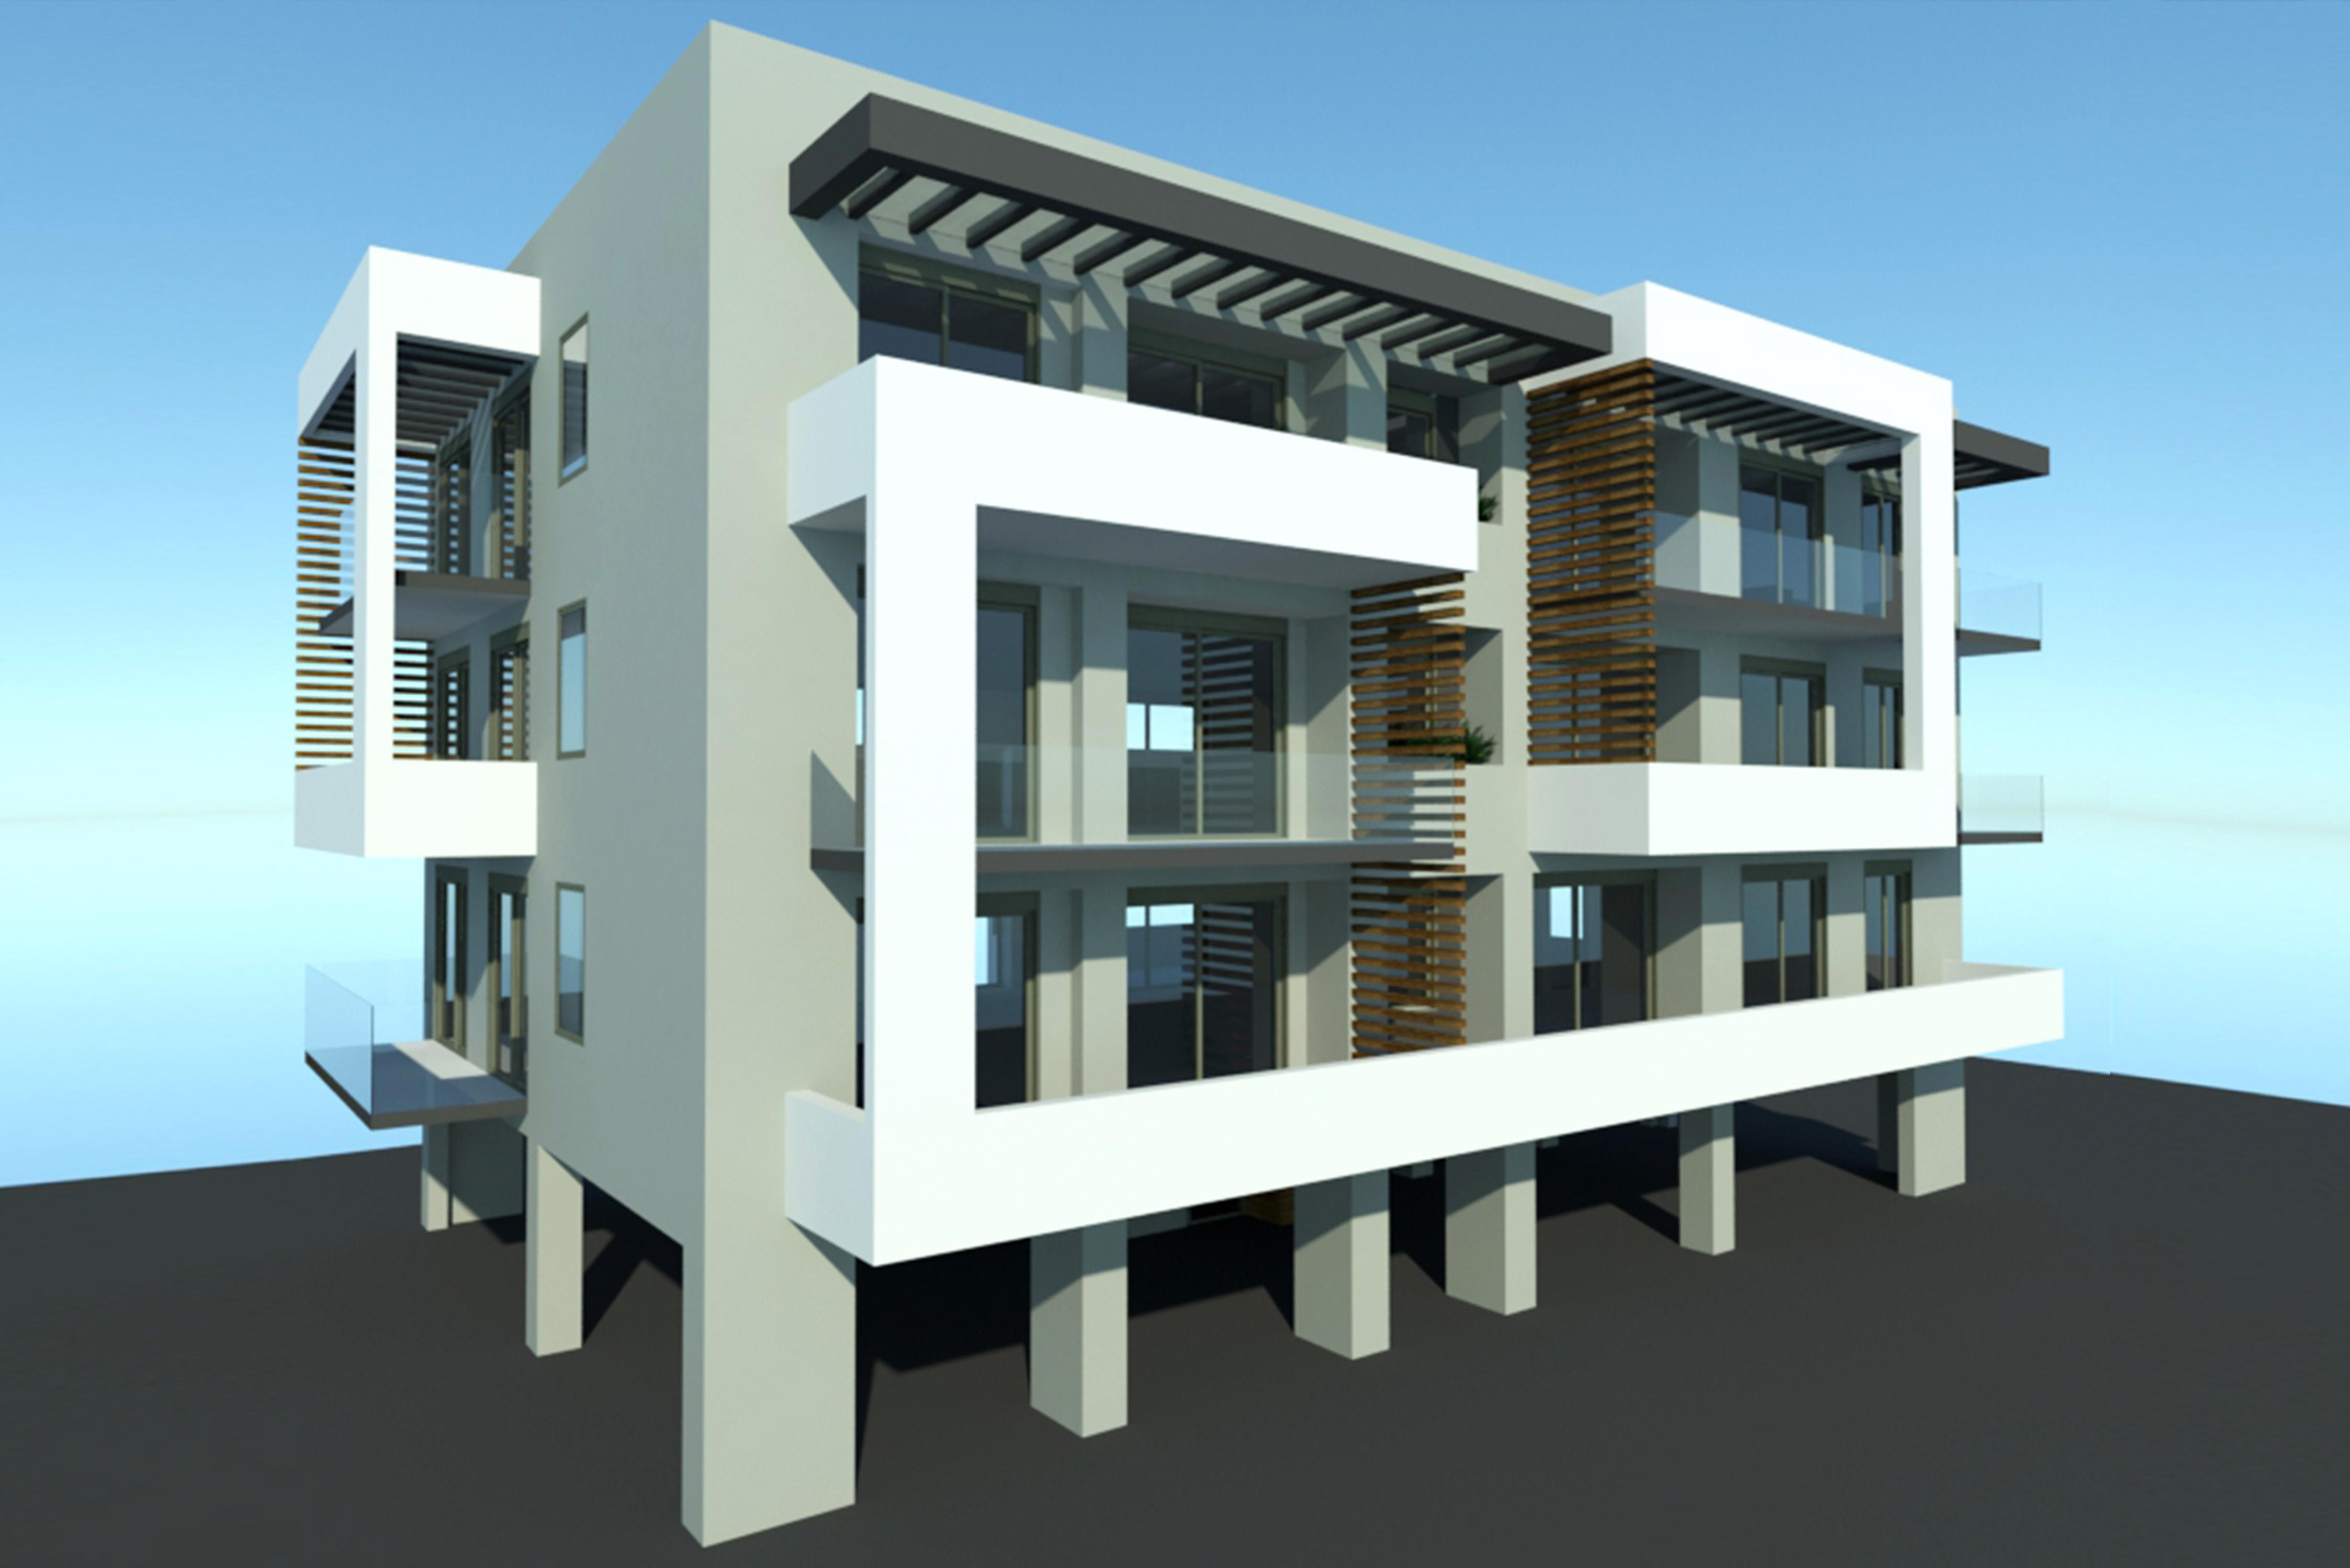 3 STOREY BUILDING WITH PILOTIS – CHANIA – CRETE